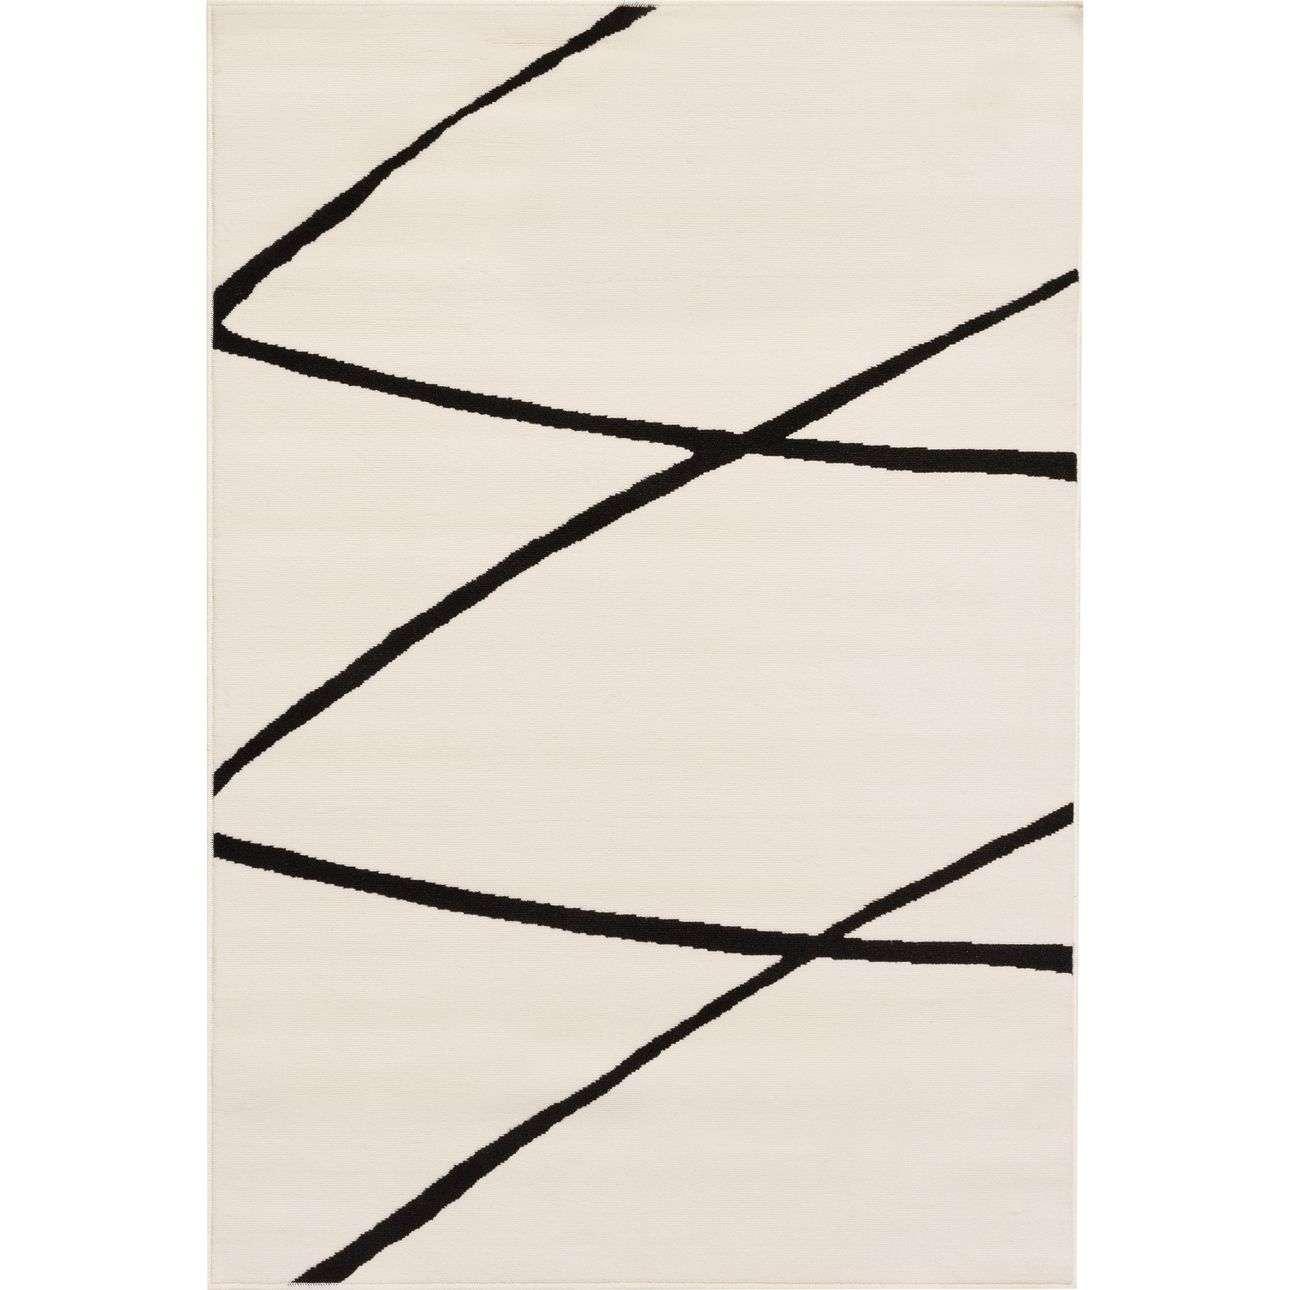 Teppich Modern Lines cream-black 135x190cm